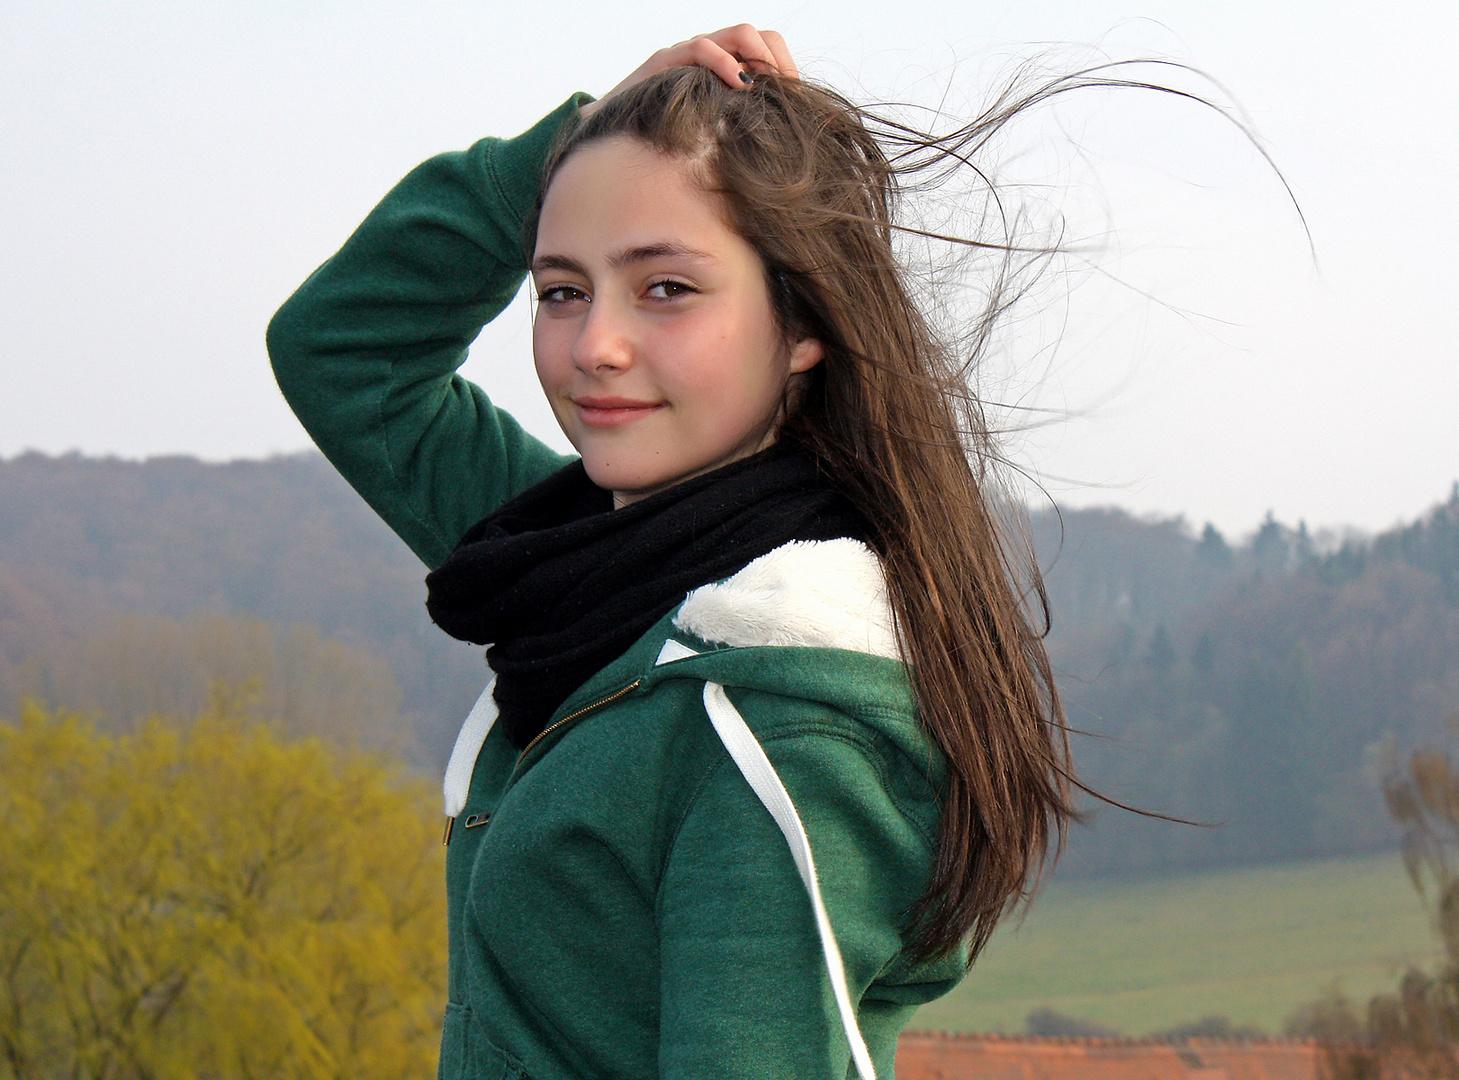 Michelle outdoor